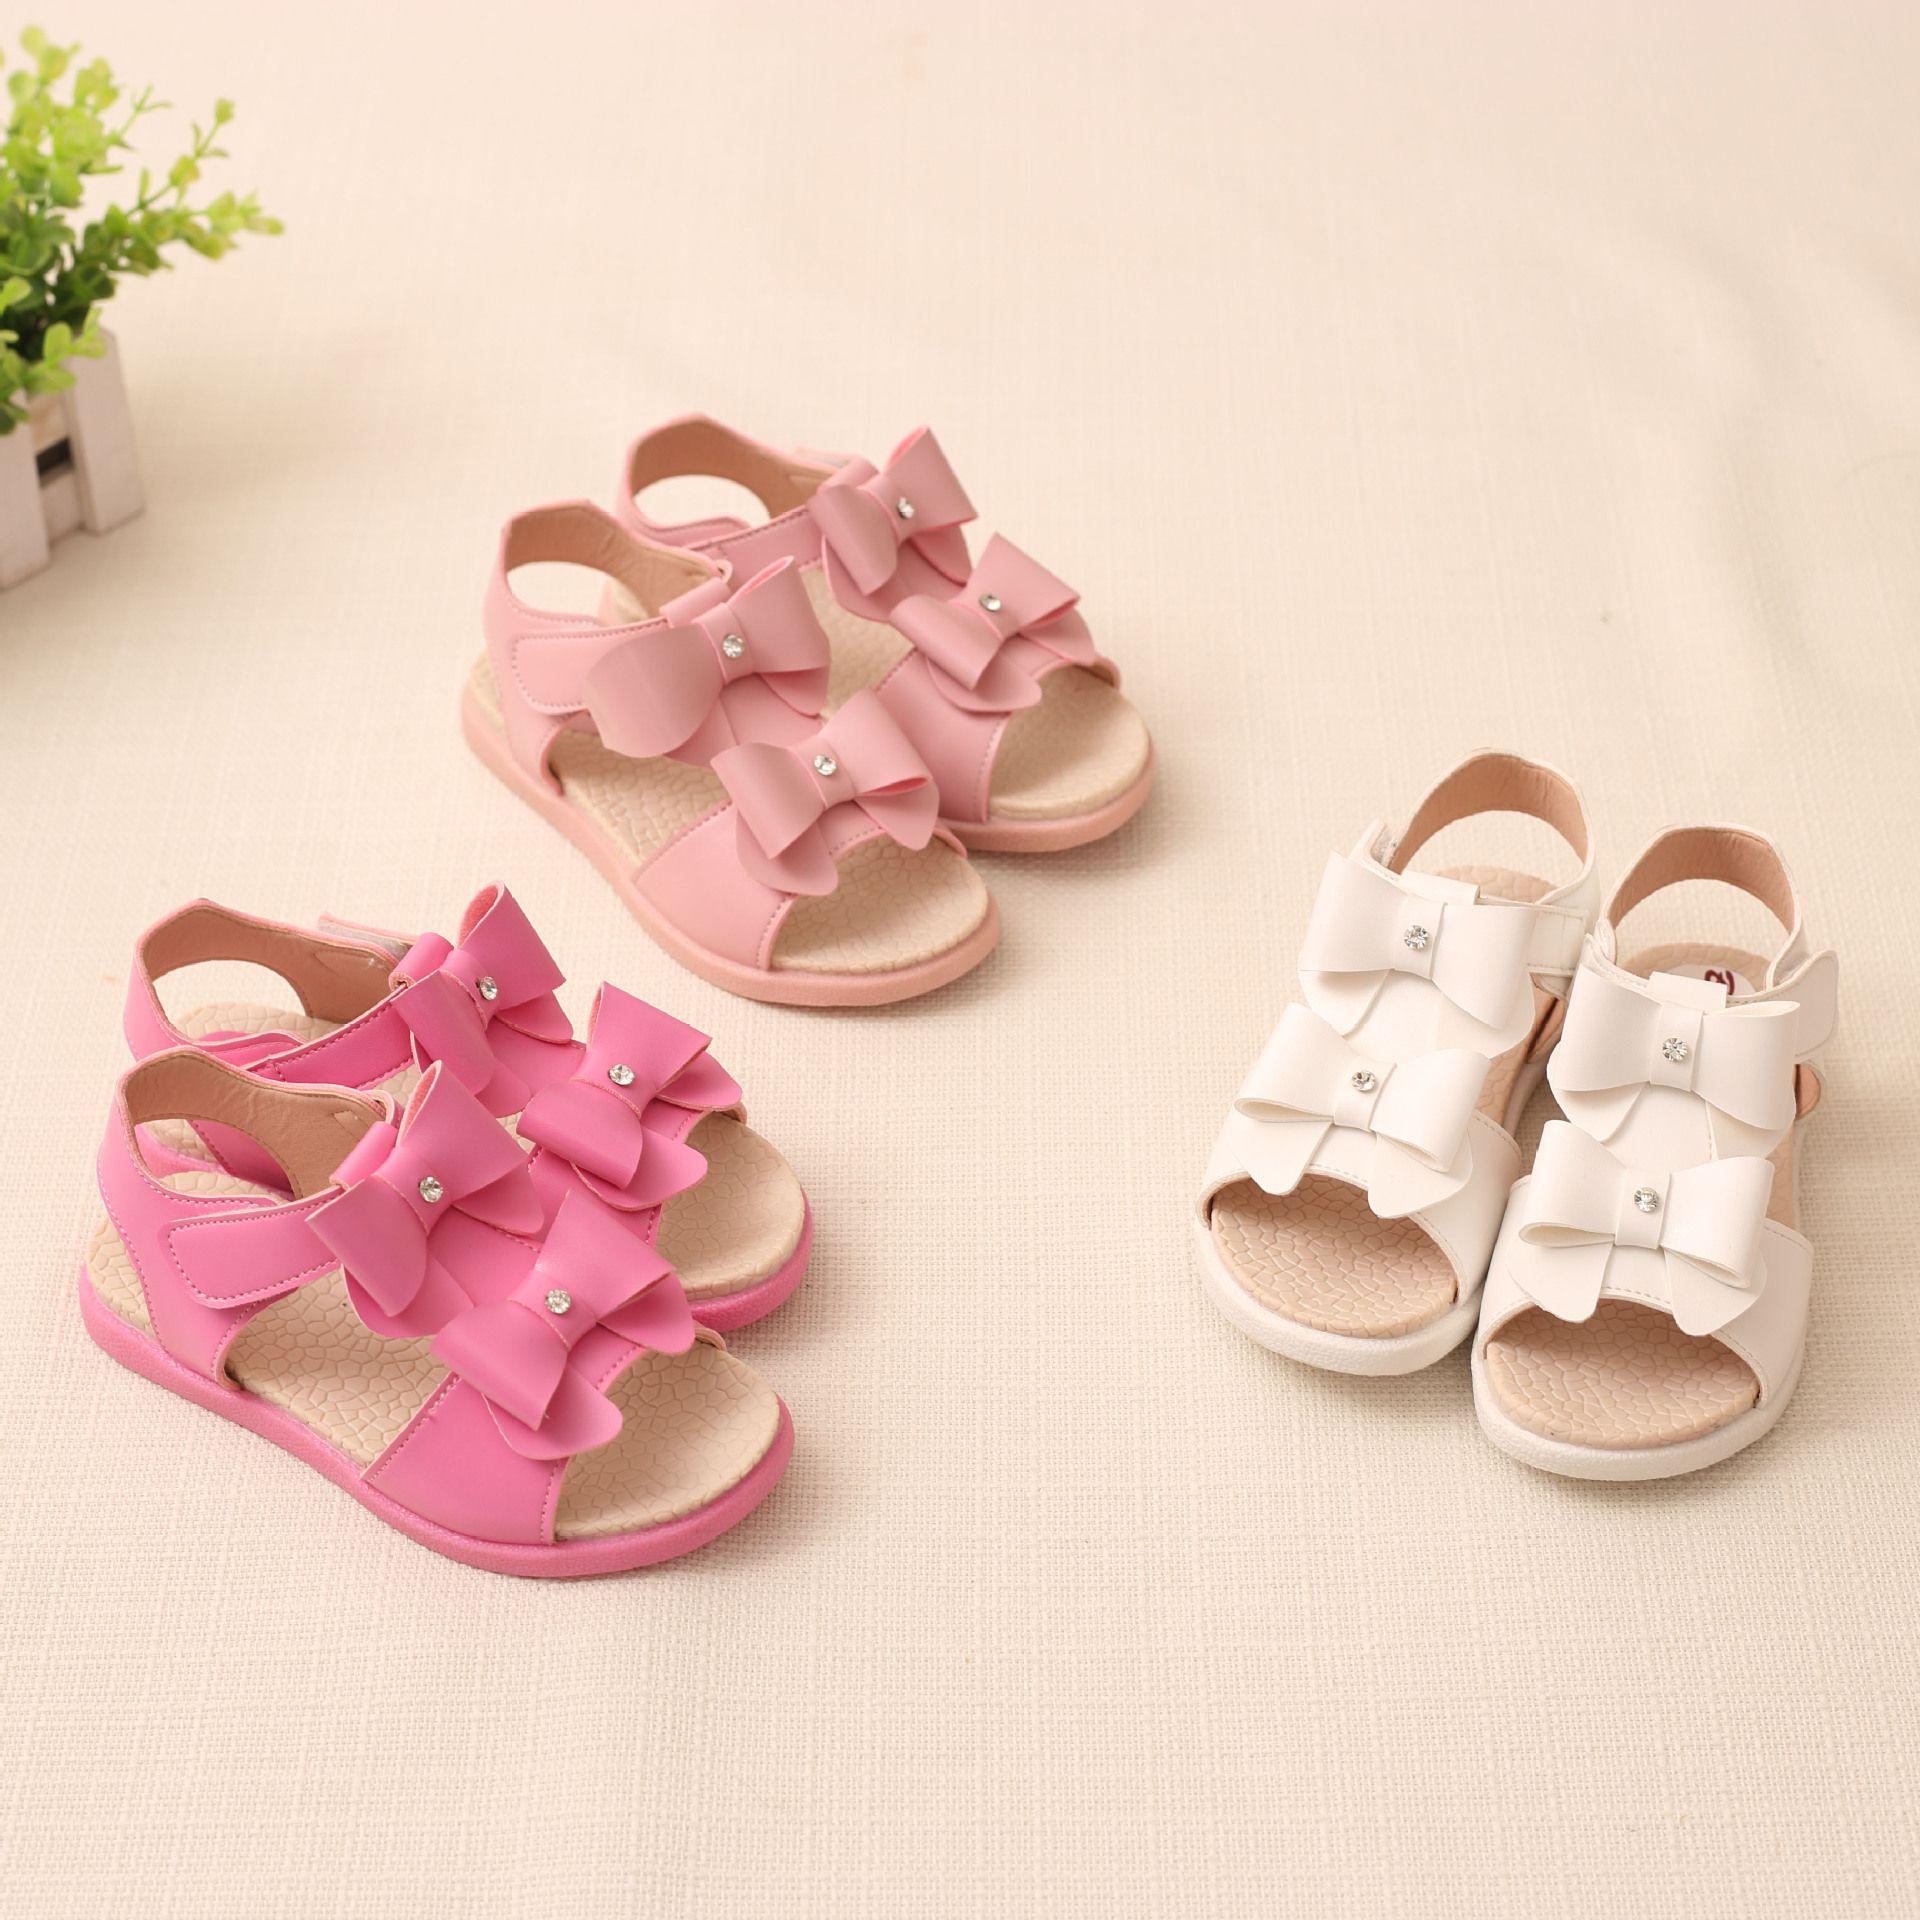 Girls Sandal Bow tie Princess Shoes Baby Shoes Children Sandals Infant Shoes Girls Summer Sandals Kids Footwear Toddler Sandals